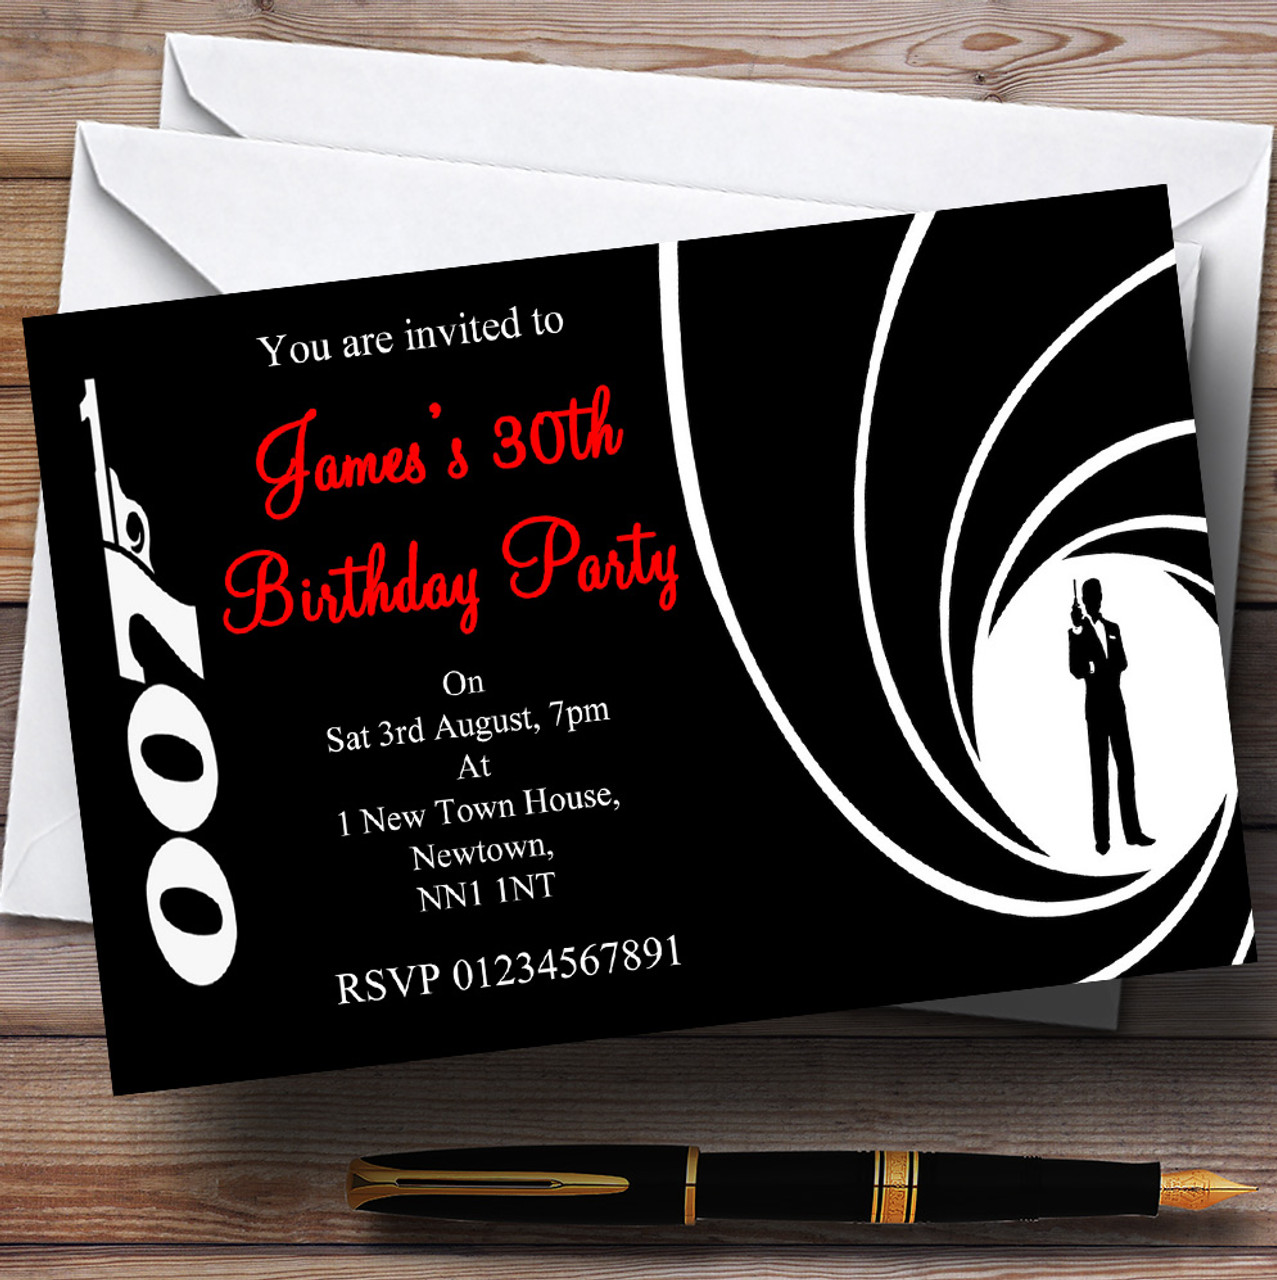 James bond personalised party invitations the card zoo james bond personalised party invitations stopboris Choice Image